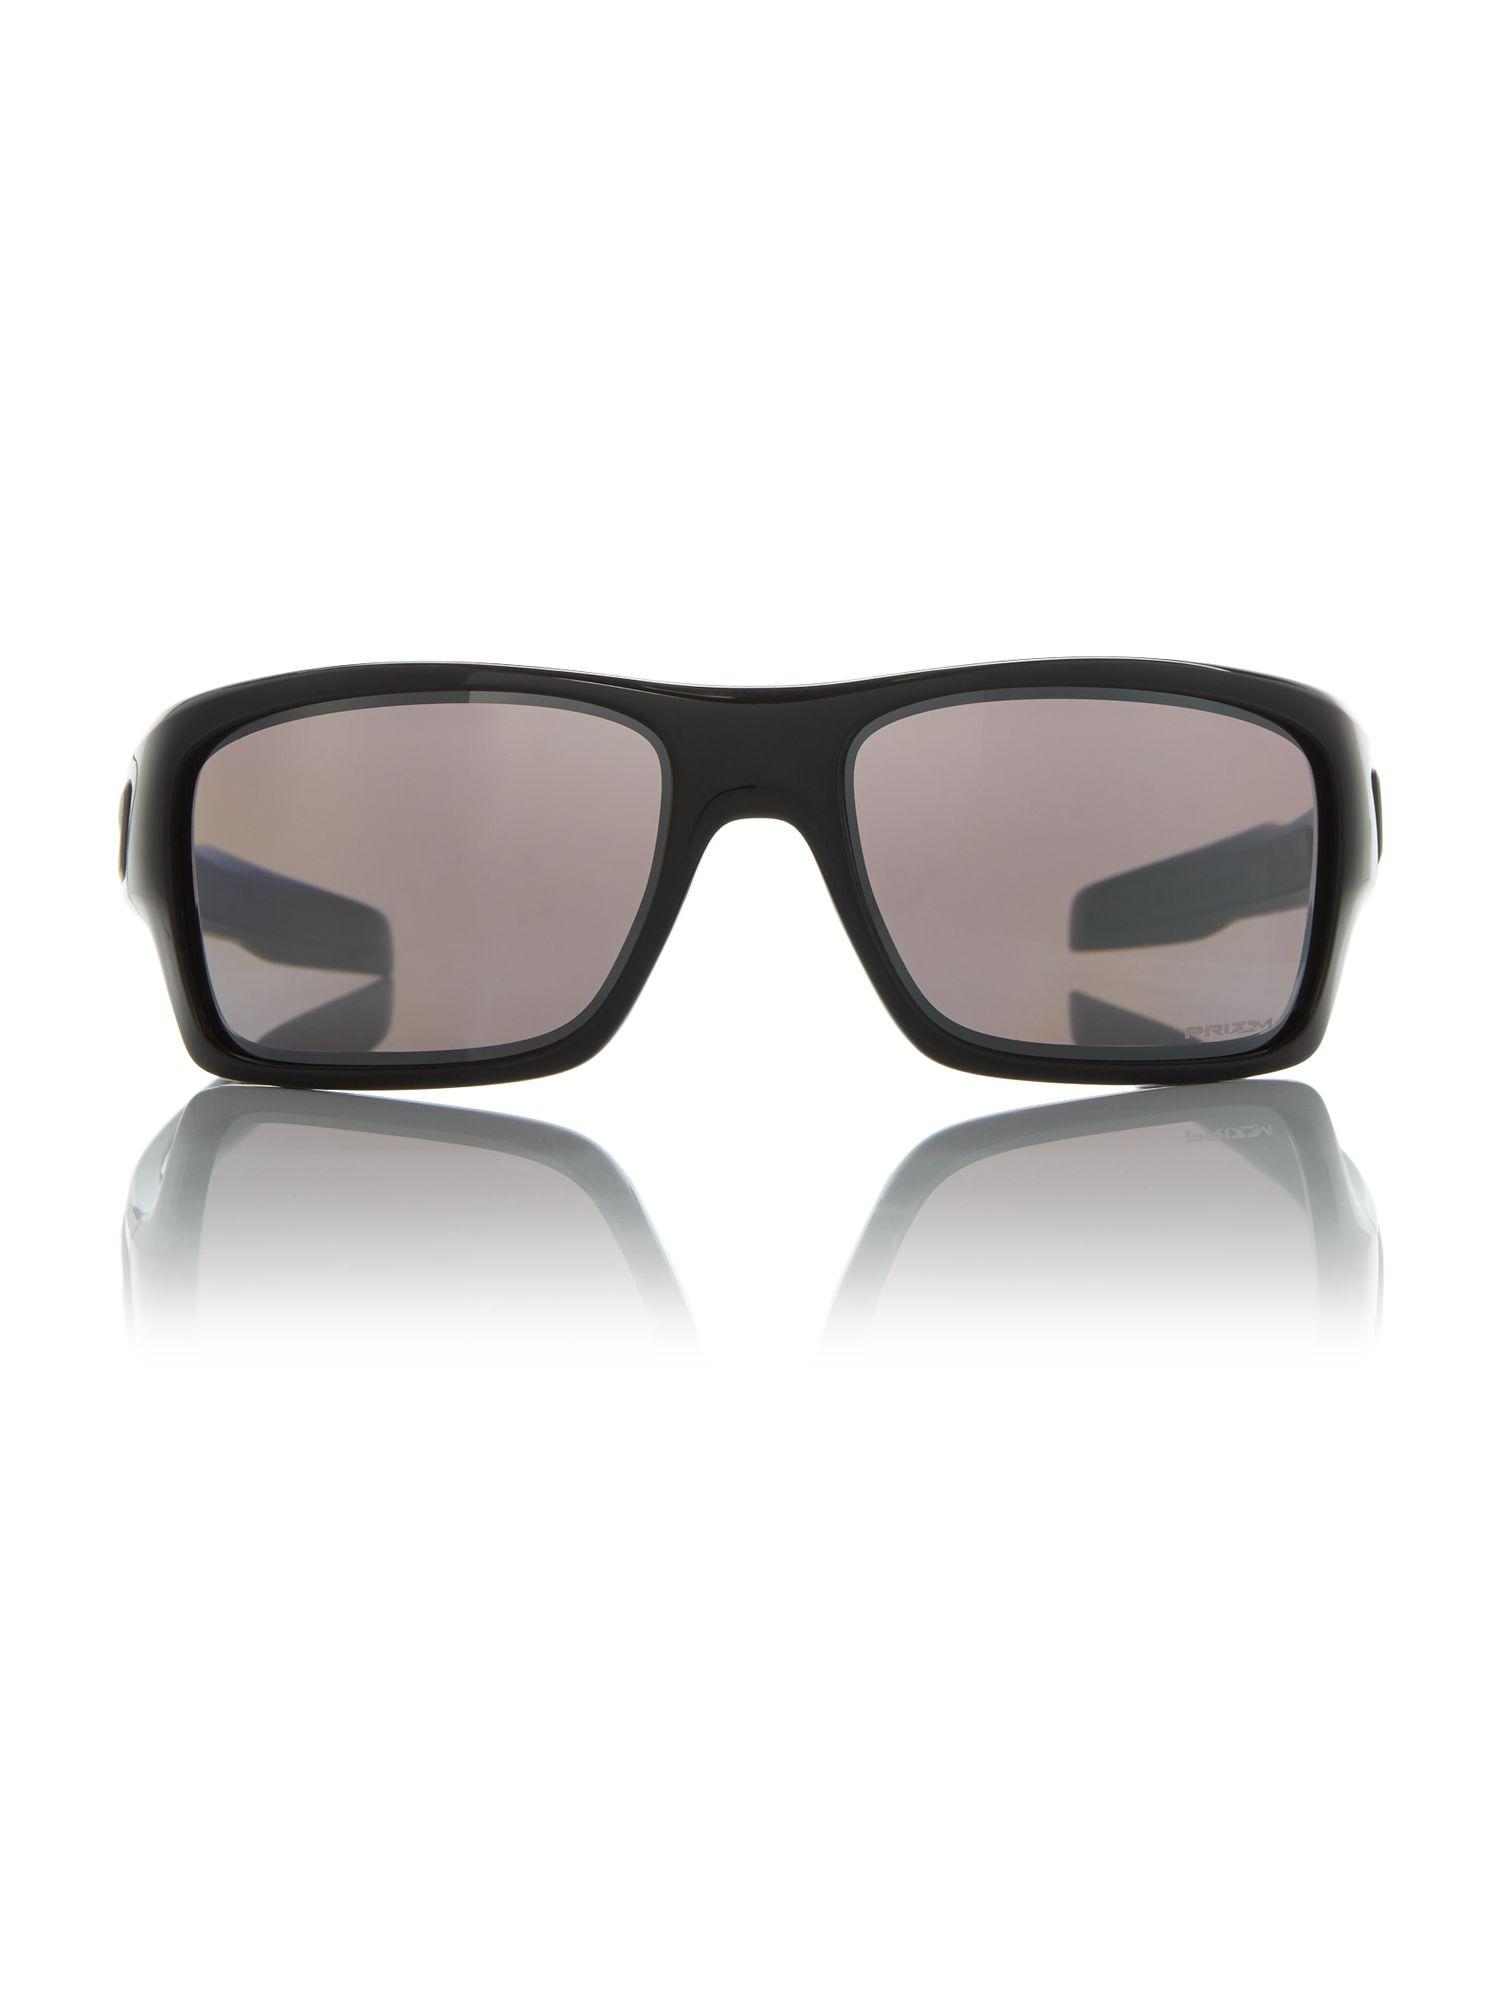 Oakley Polished Black Oo9263 Turbine Rectangle Sunglasse for Men